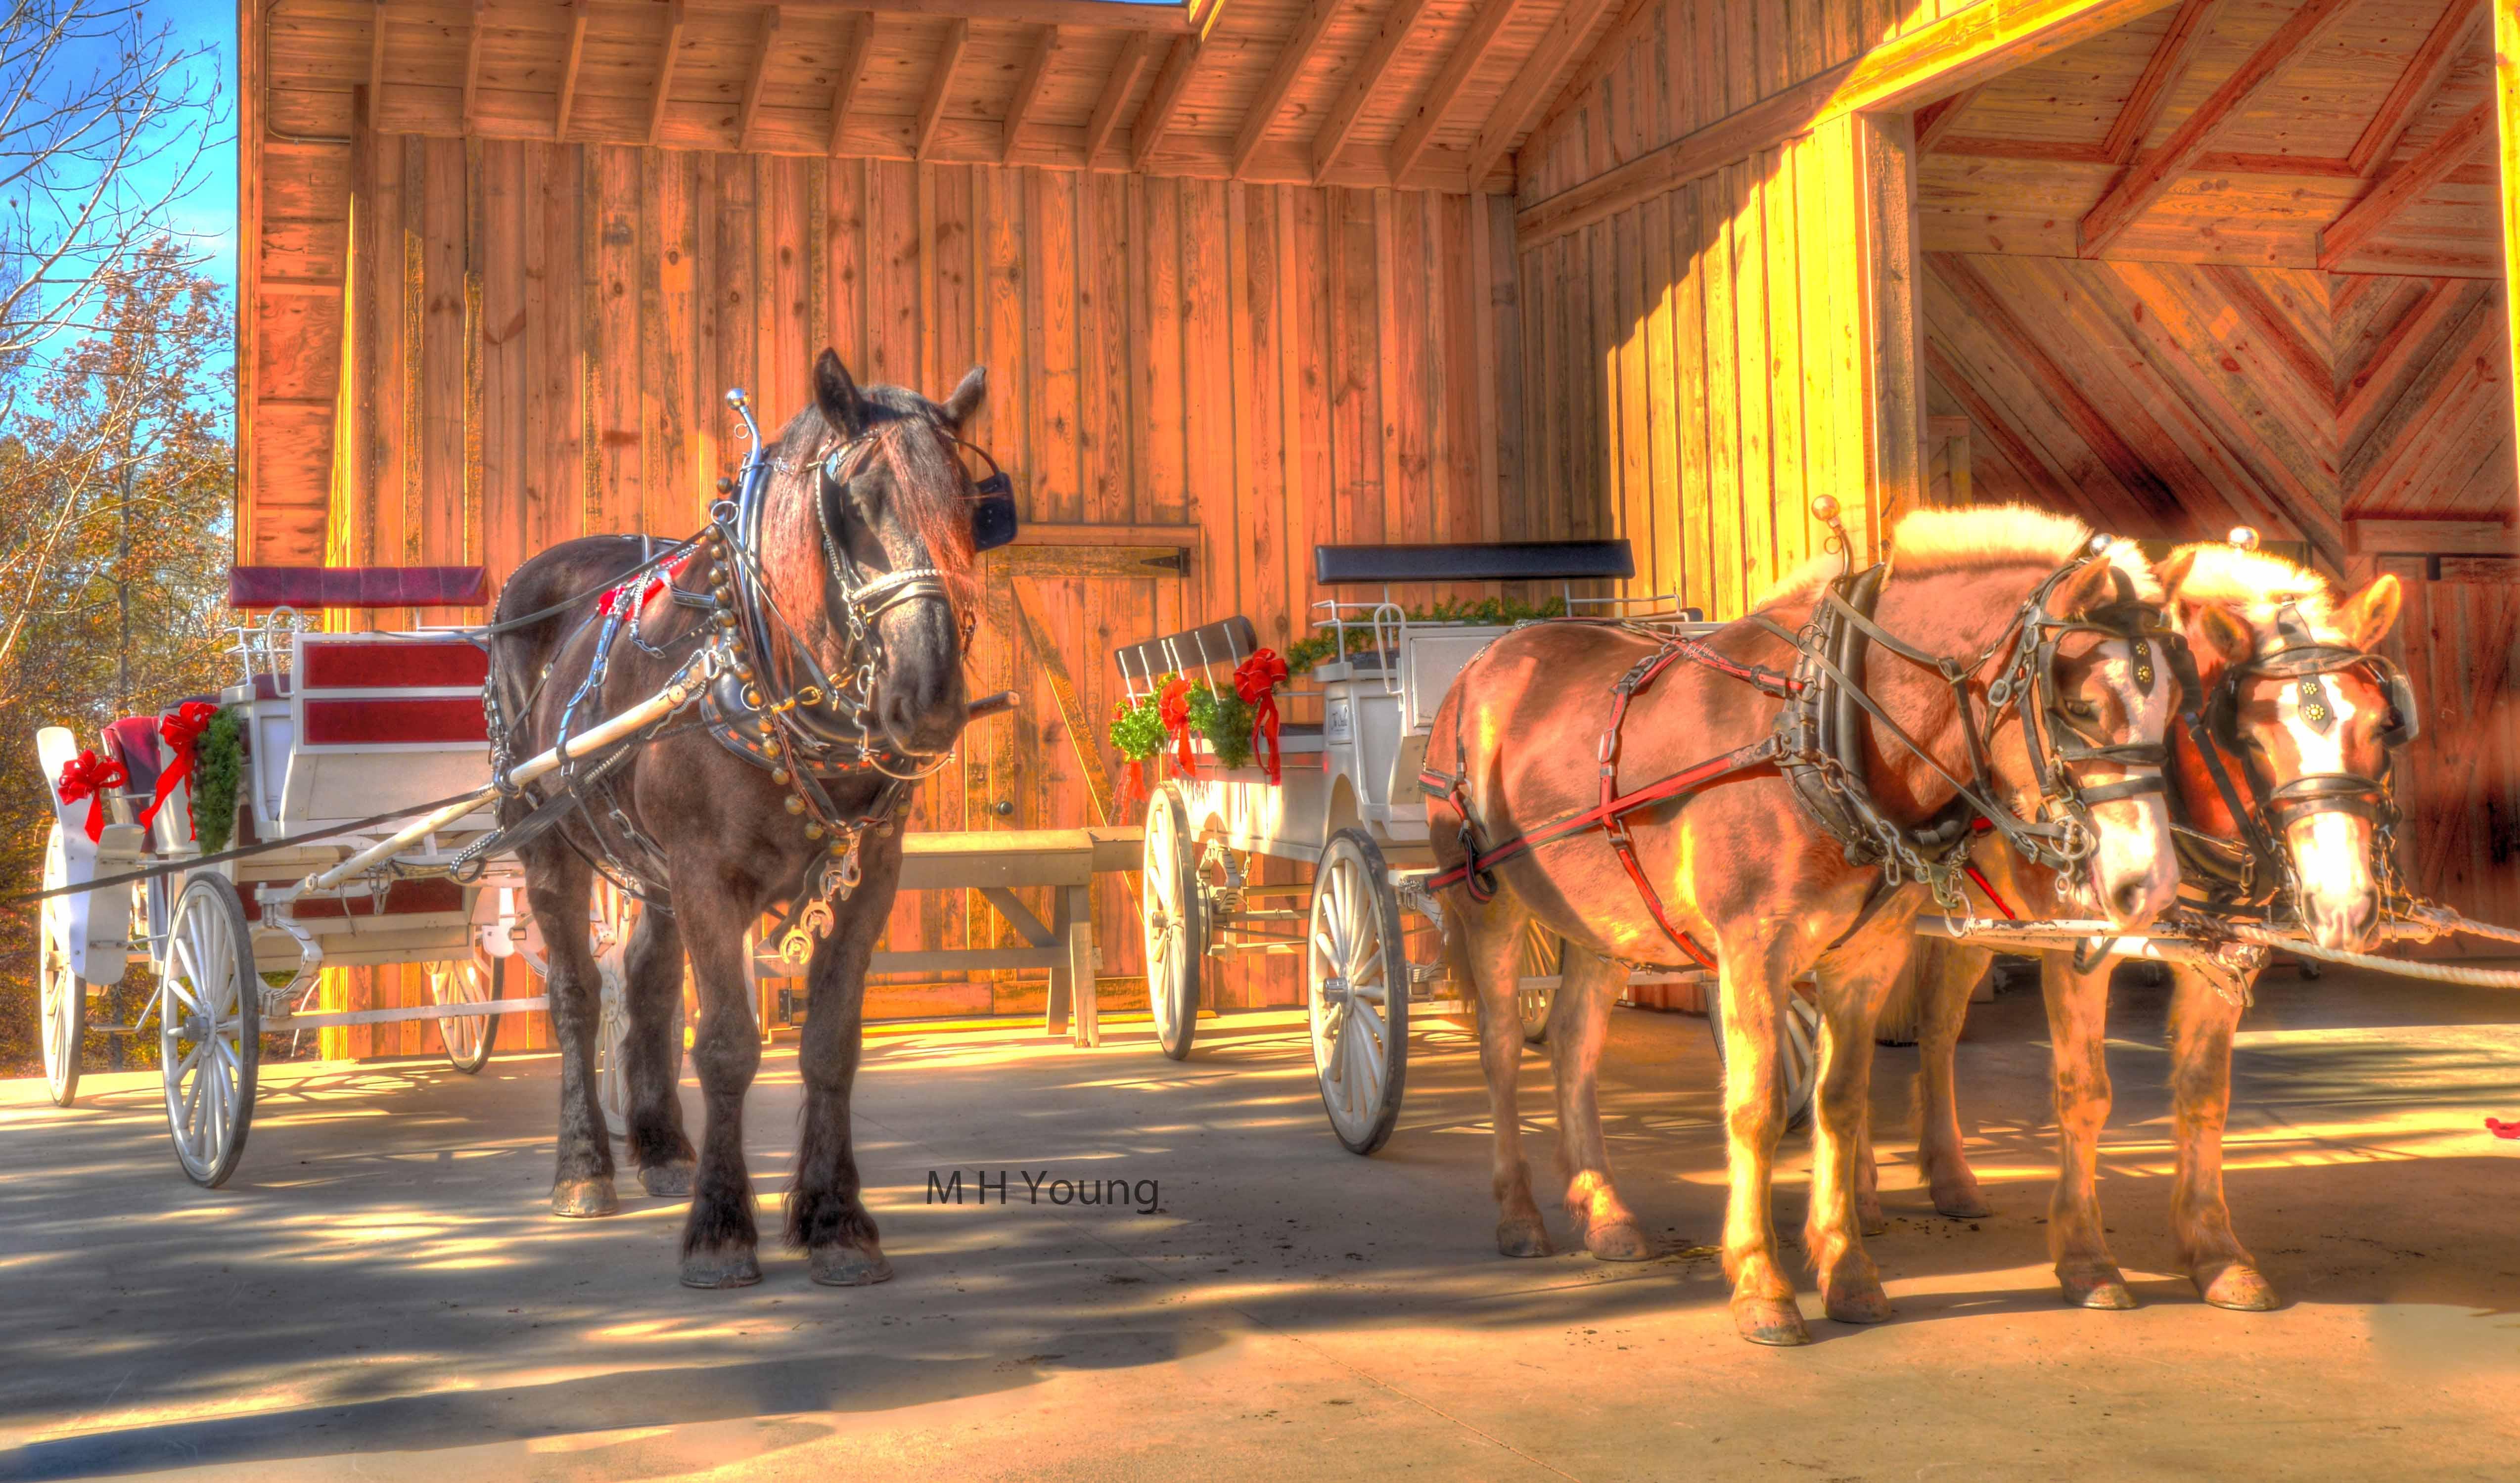 Horses & Buggy #4wm  lr.jpg